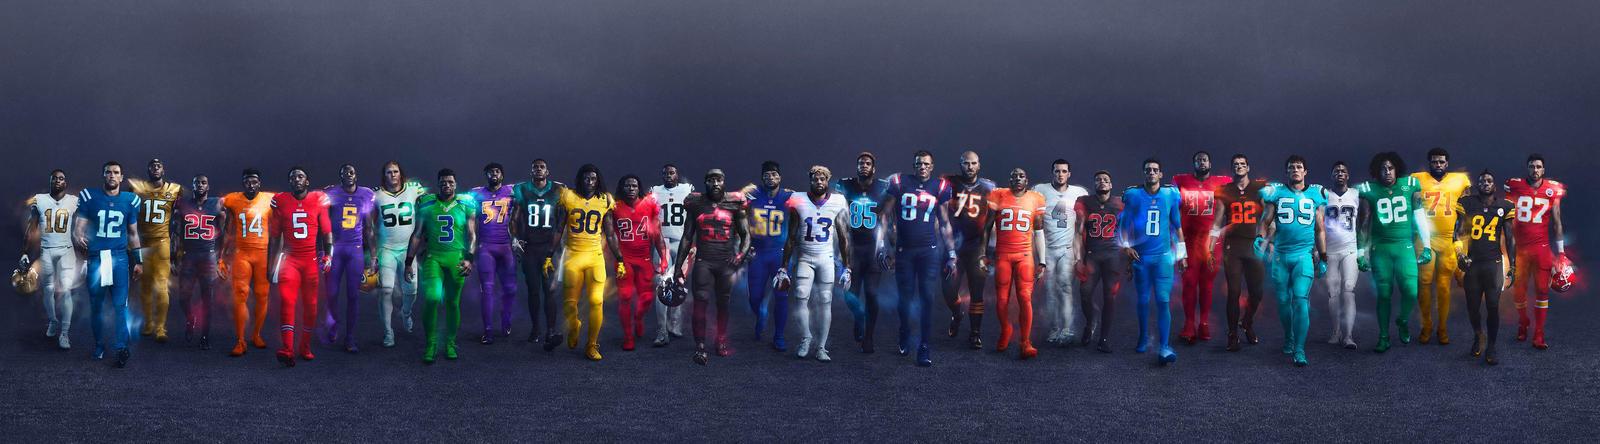 Nike And Nfl Light Up Thursday Night Football Nike News